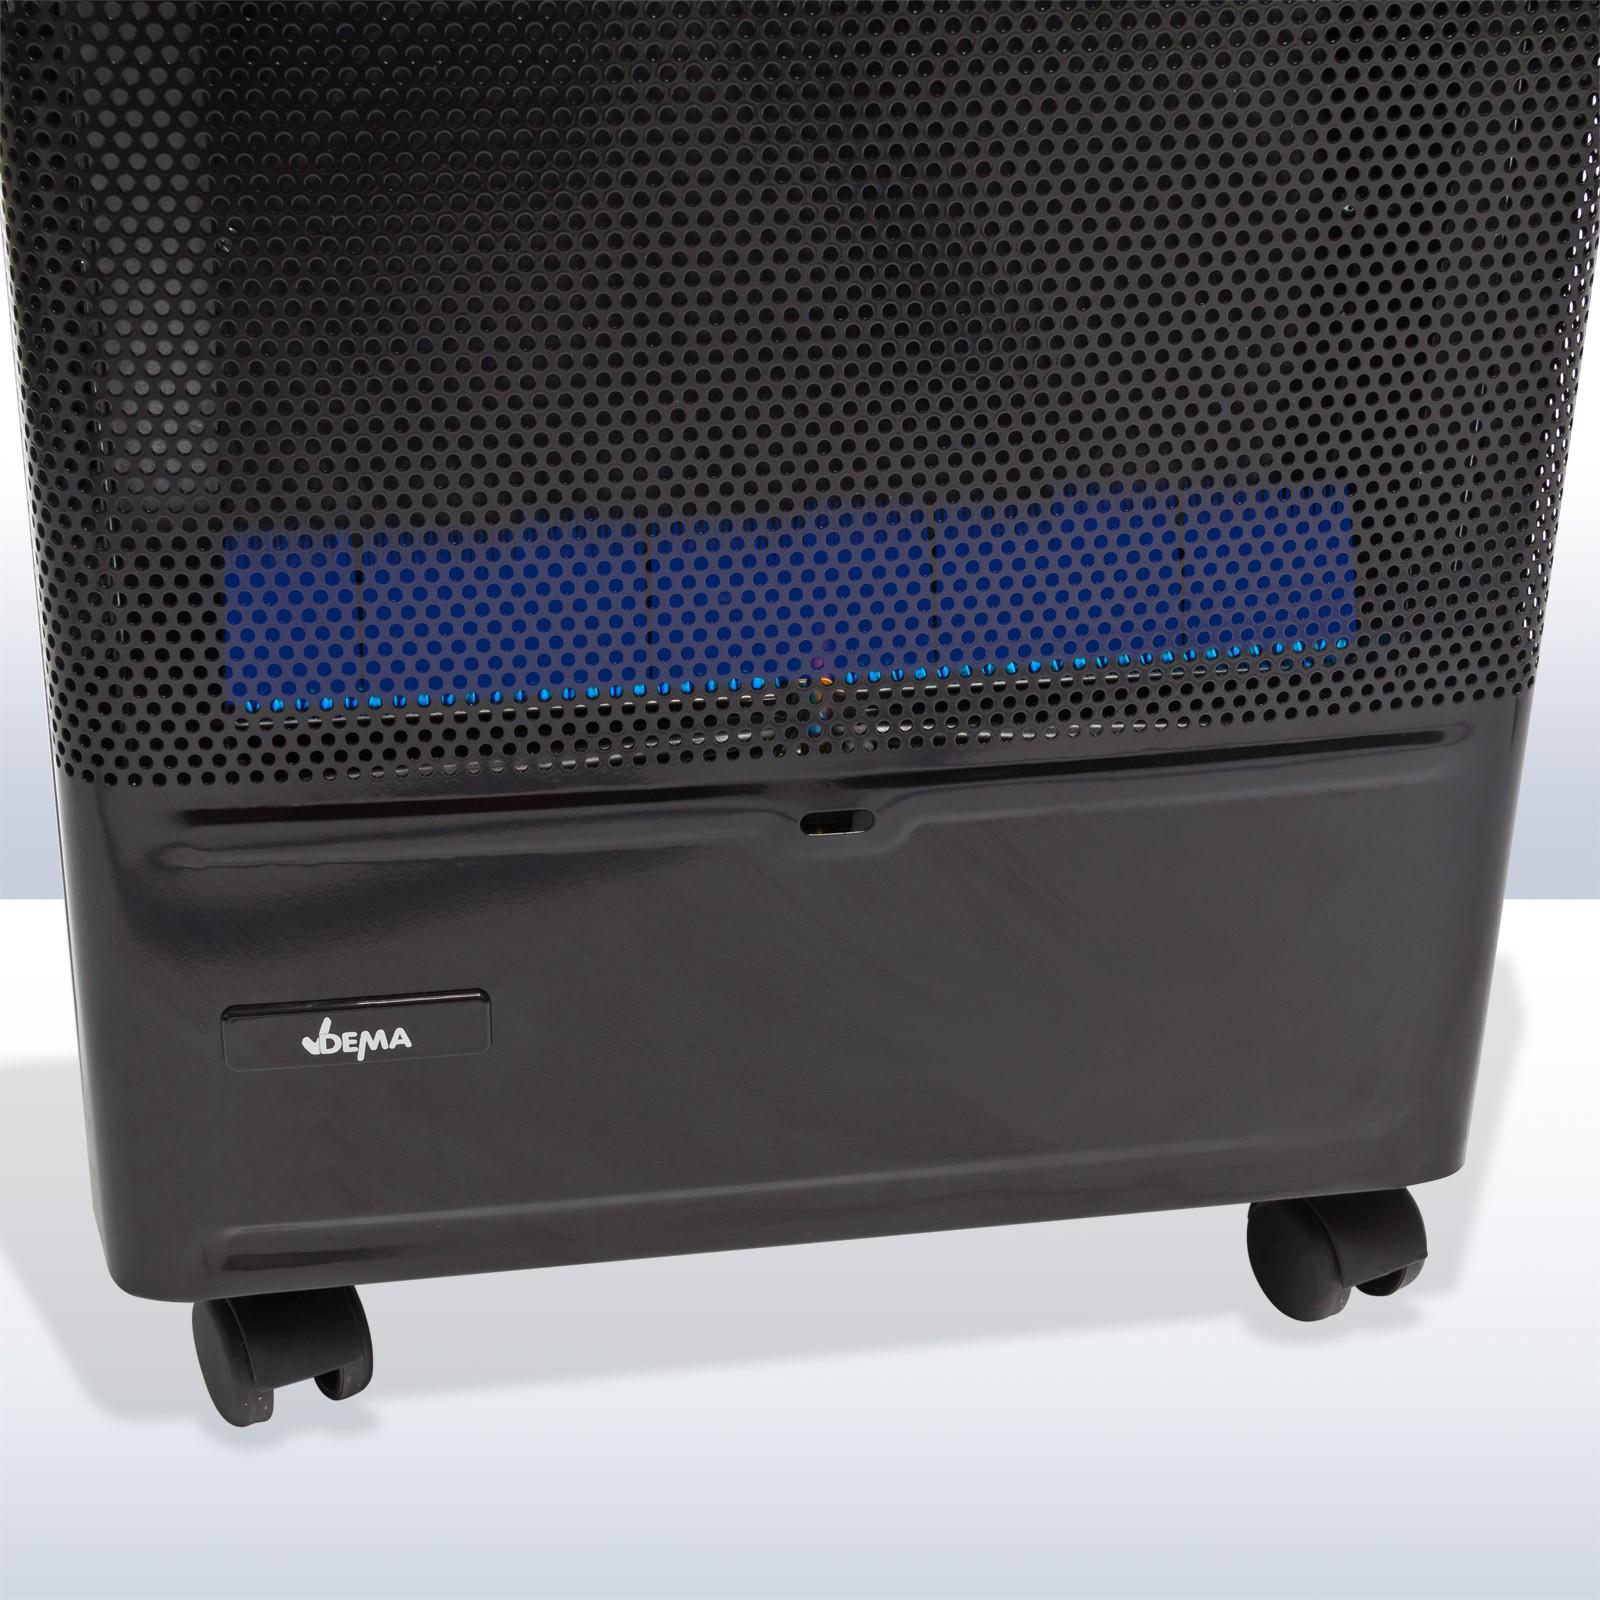 gas katalytofen blue flame blaue flamme 4200w gasofen. Black Bedroom Furniture Sets. Home Design Ideas